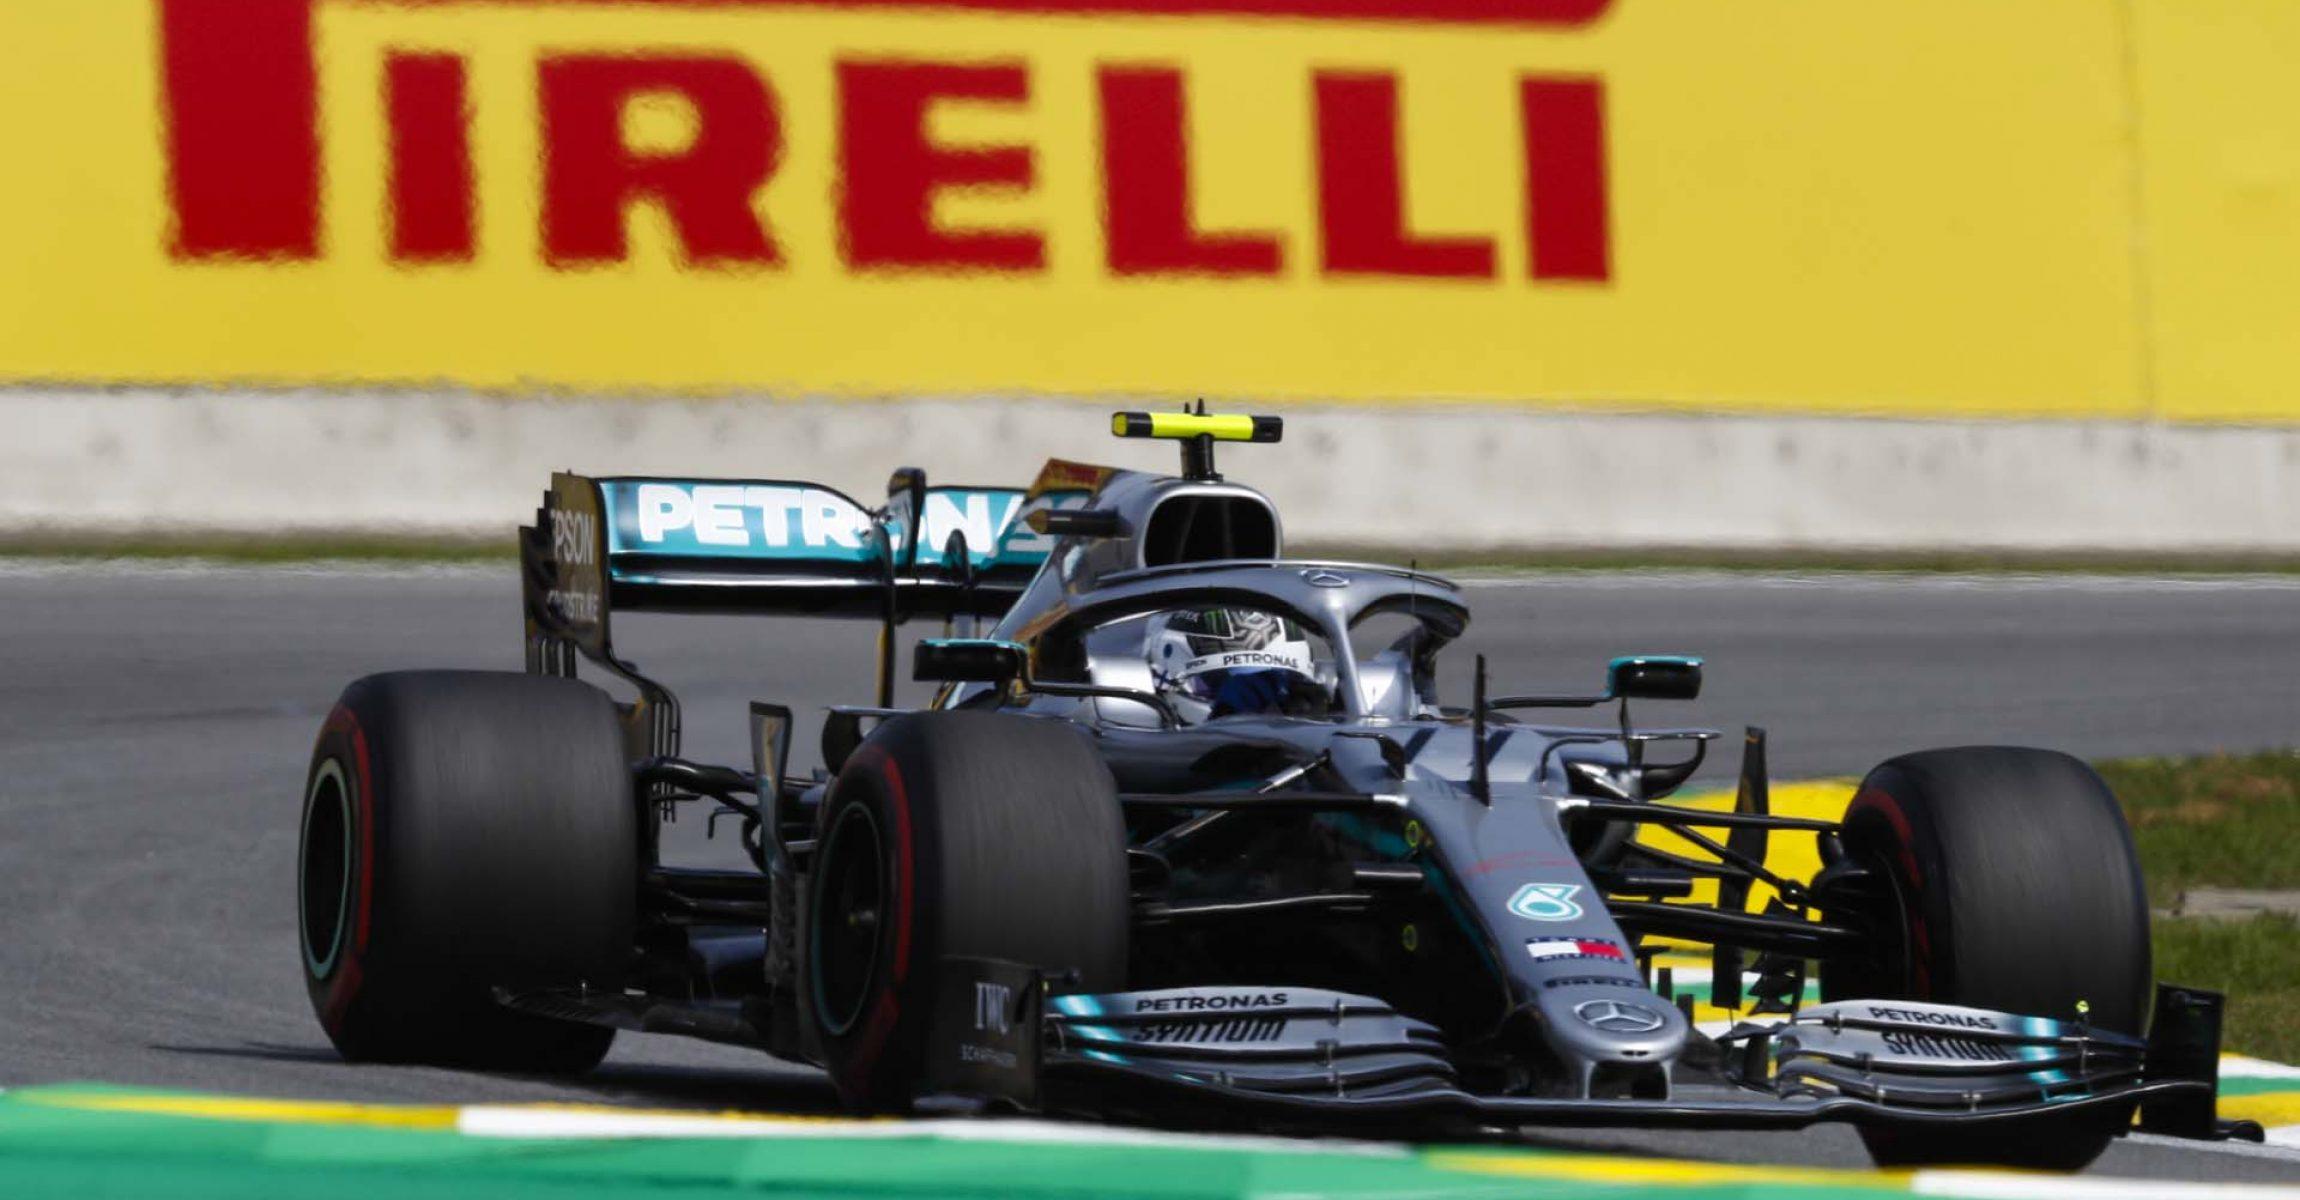 2019 Brazilian Grand Prix, Sunday - LAT Images Valtteri Bottas Mercedes